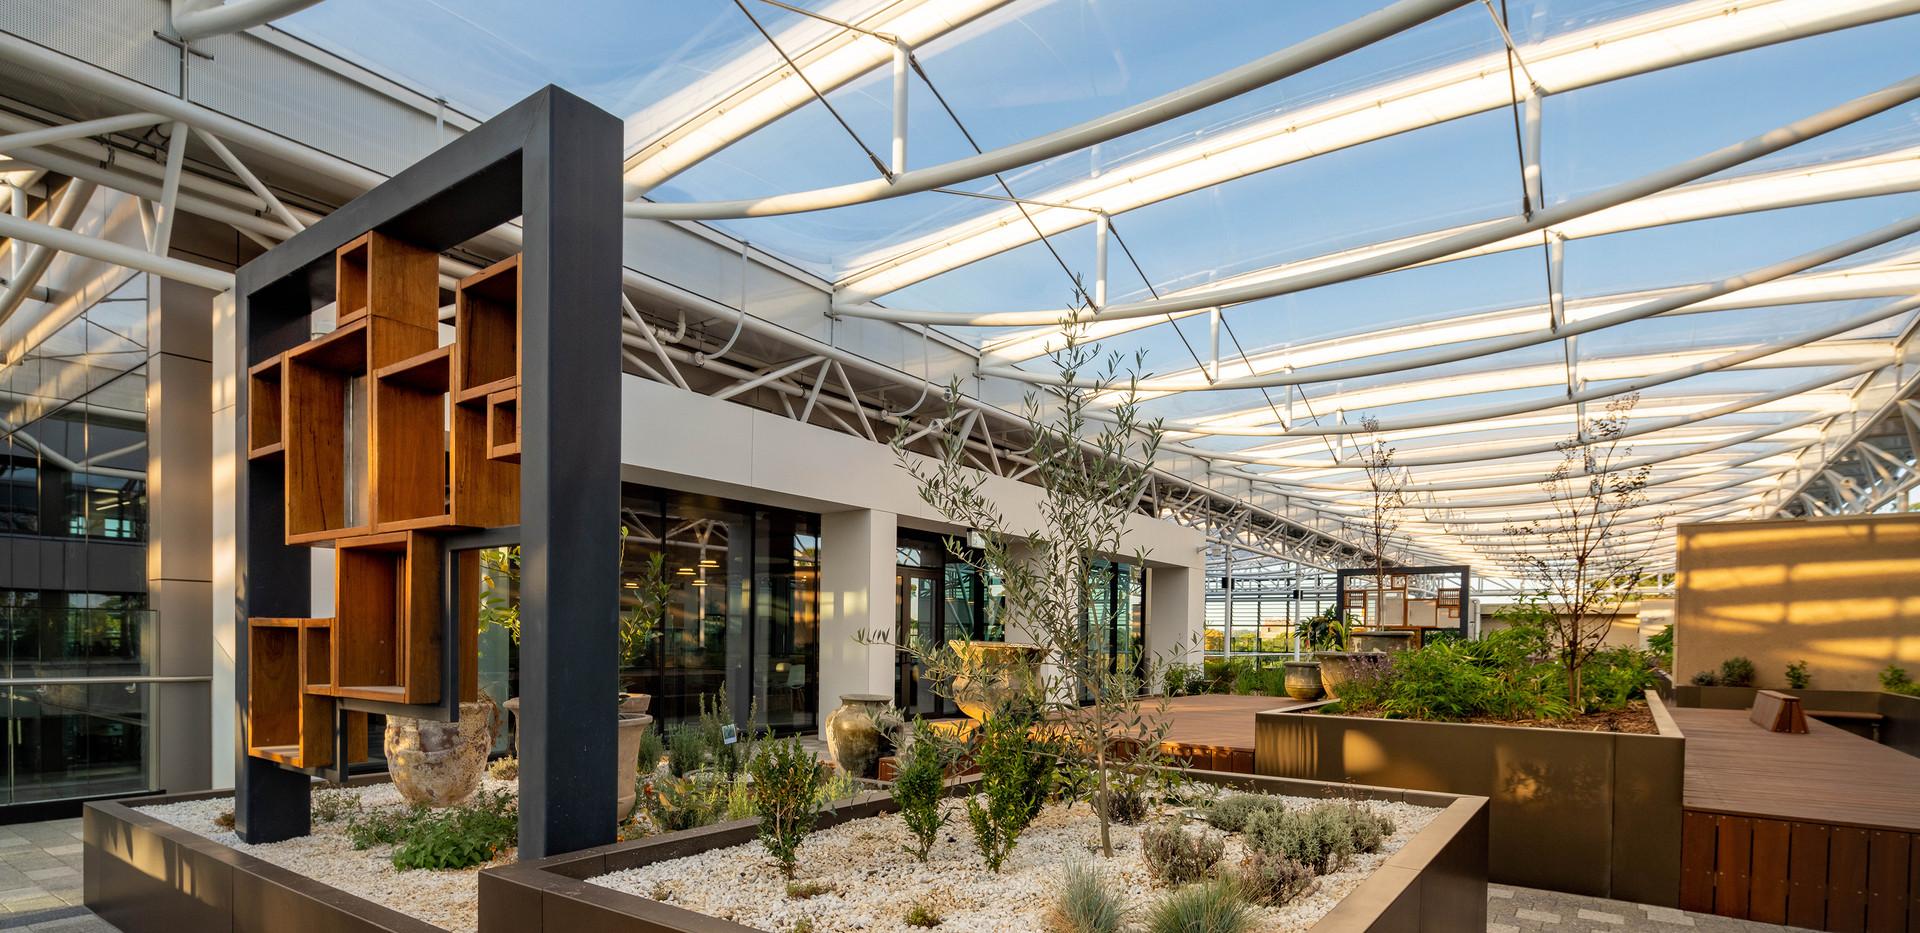 MQU_Arts_Precinct_ETFE_Roof.jpg